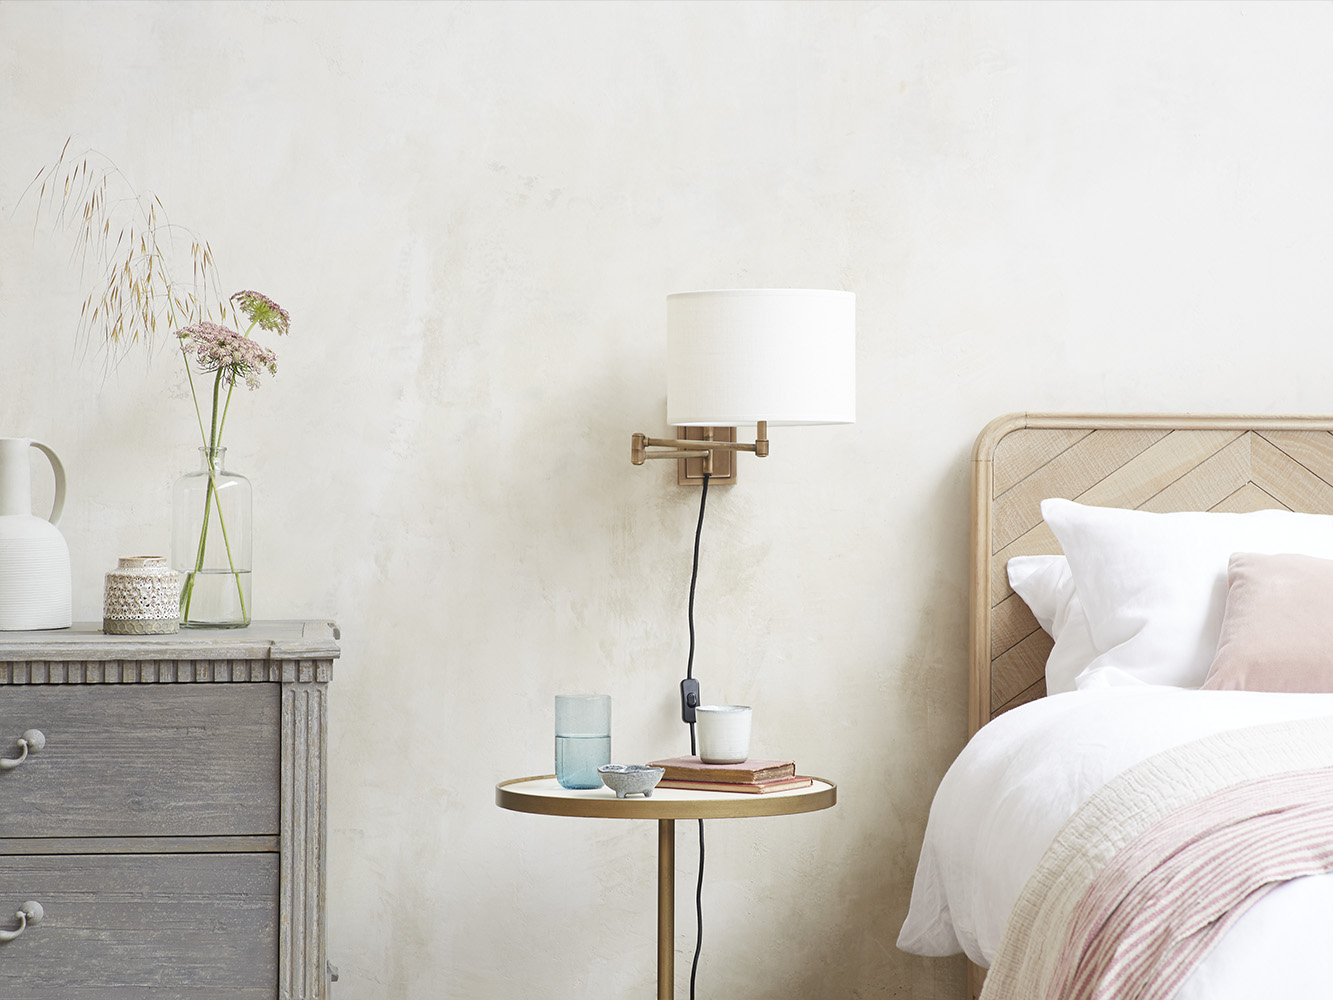 Page Turner Wall Lamp With Natural Hessian Shade